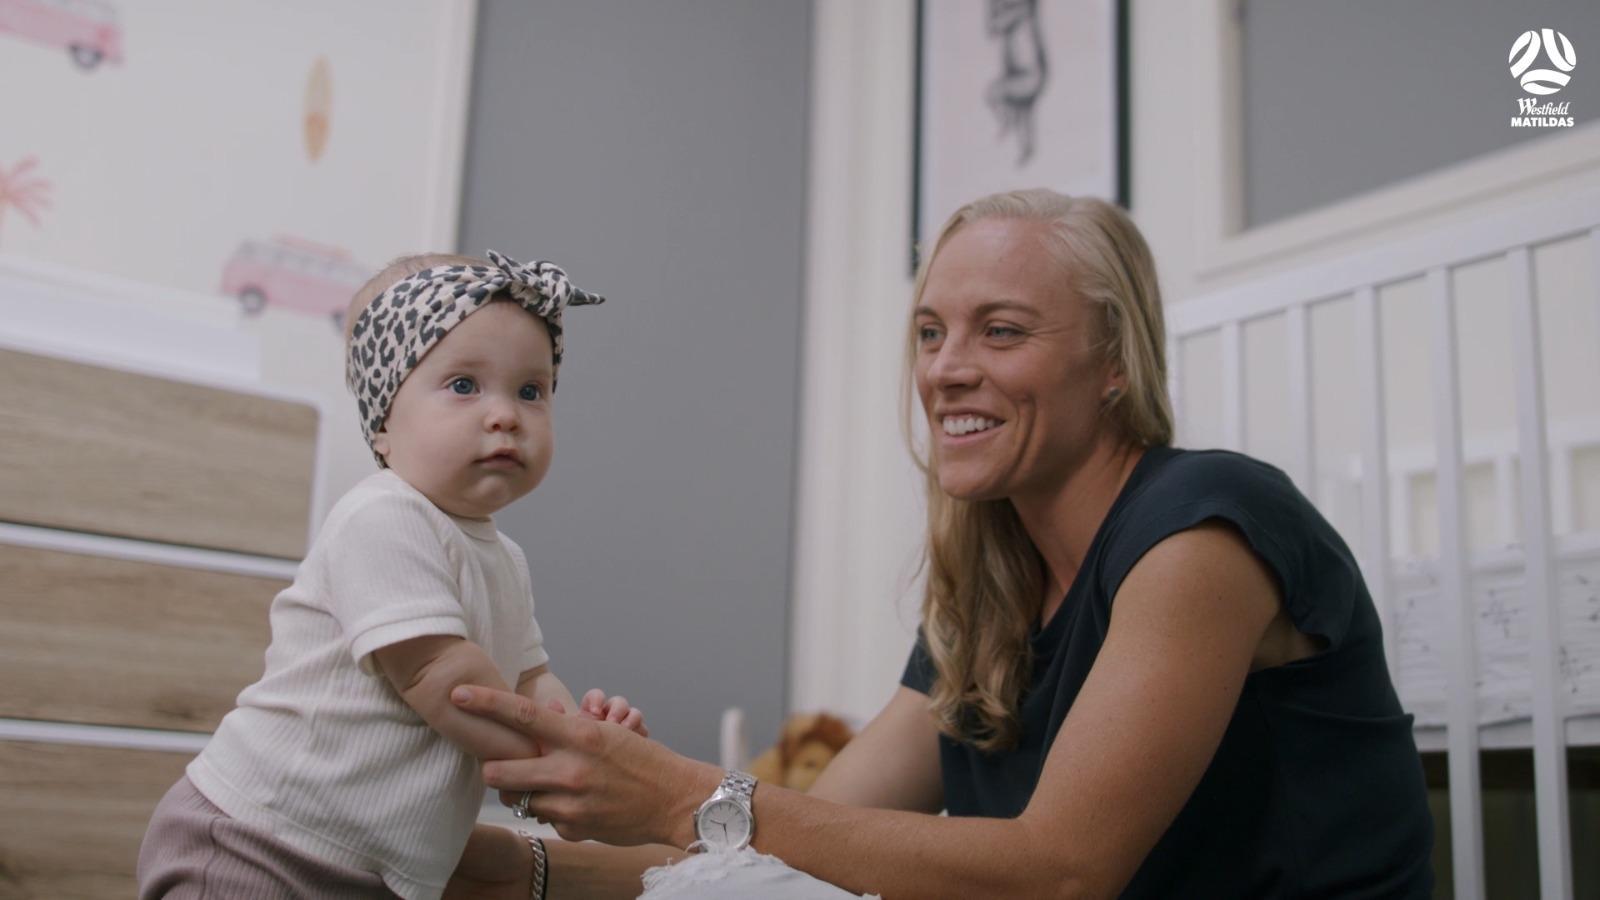 Tameka Yallop with daughter Harley